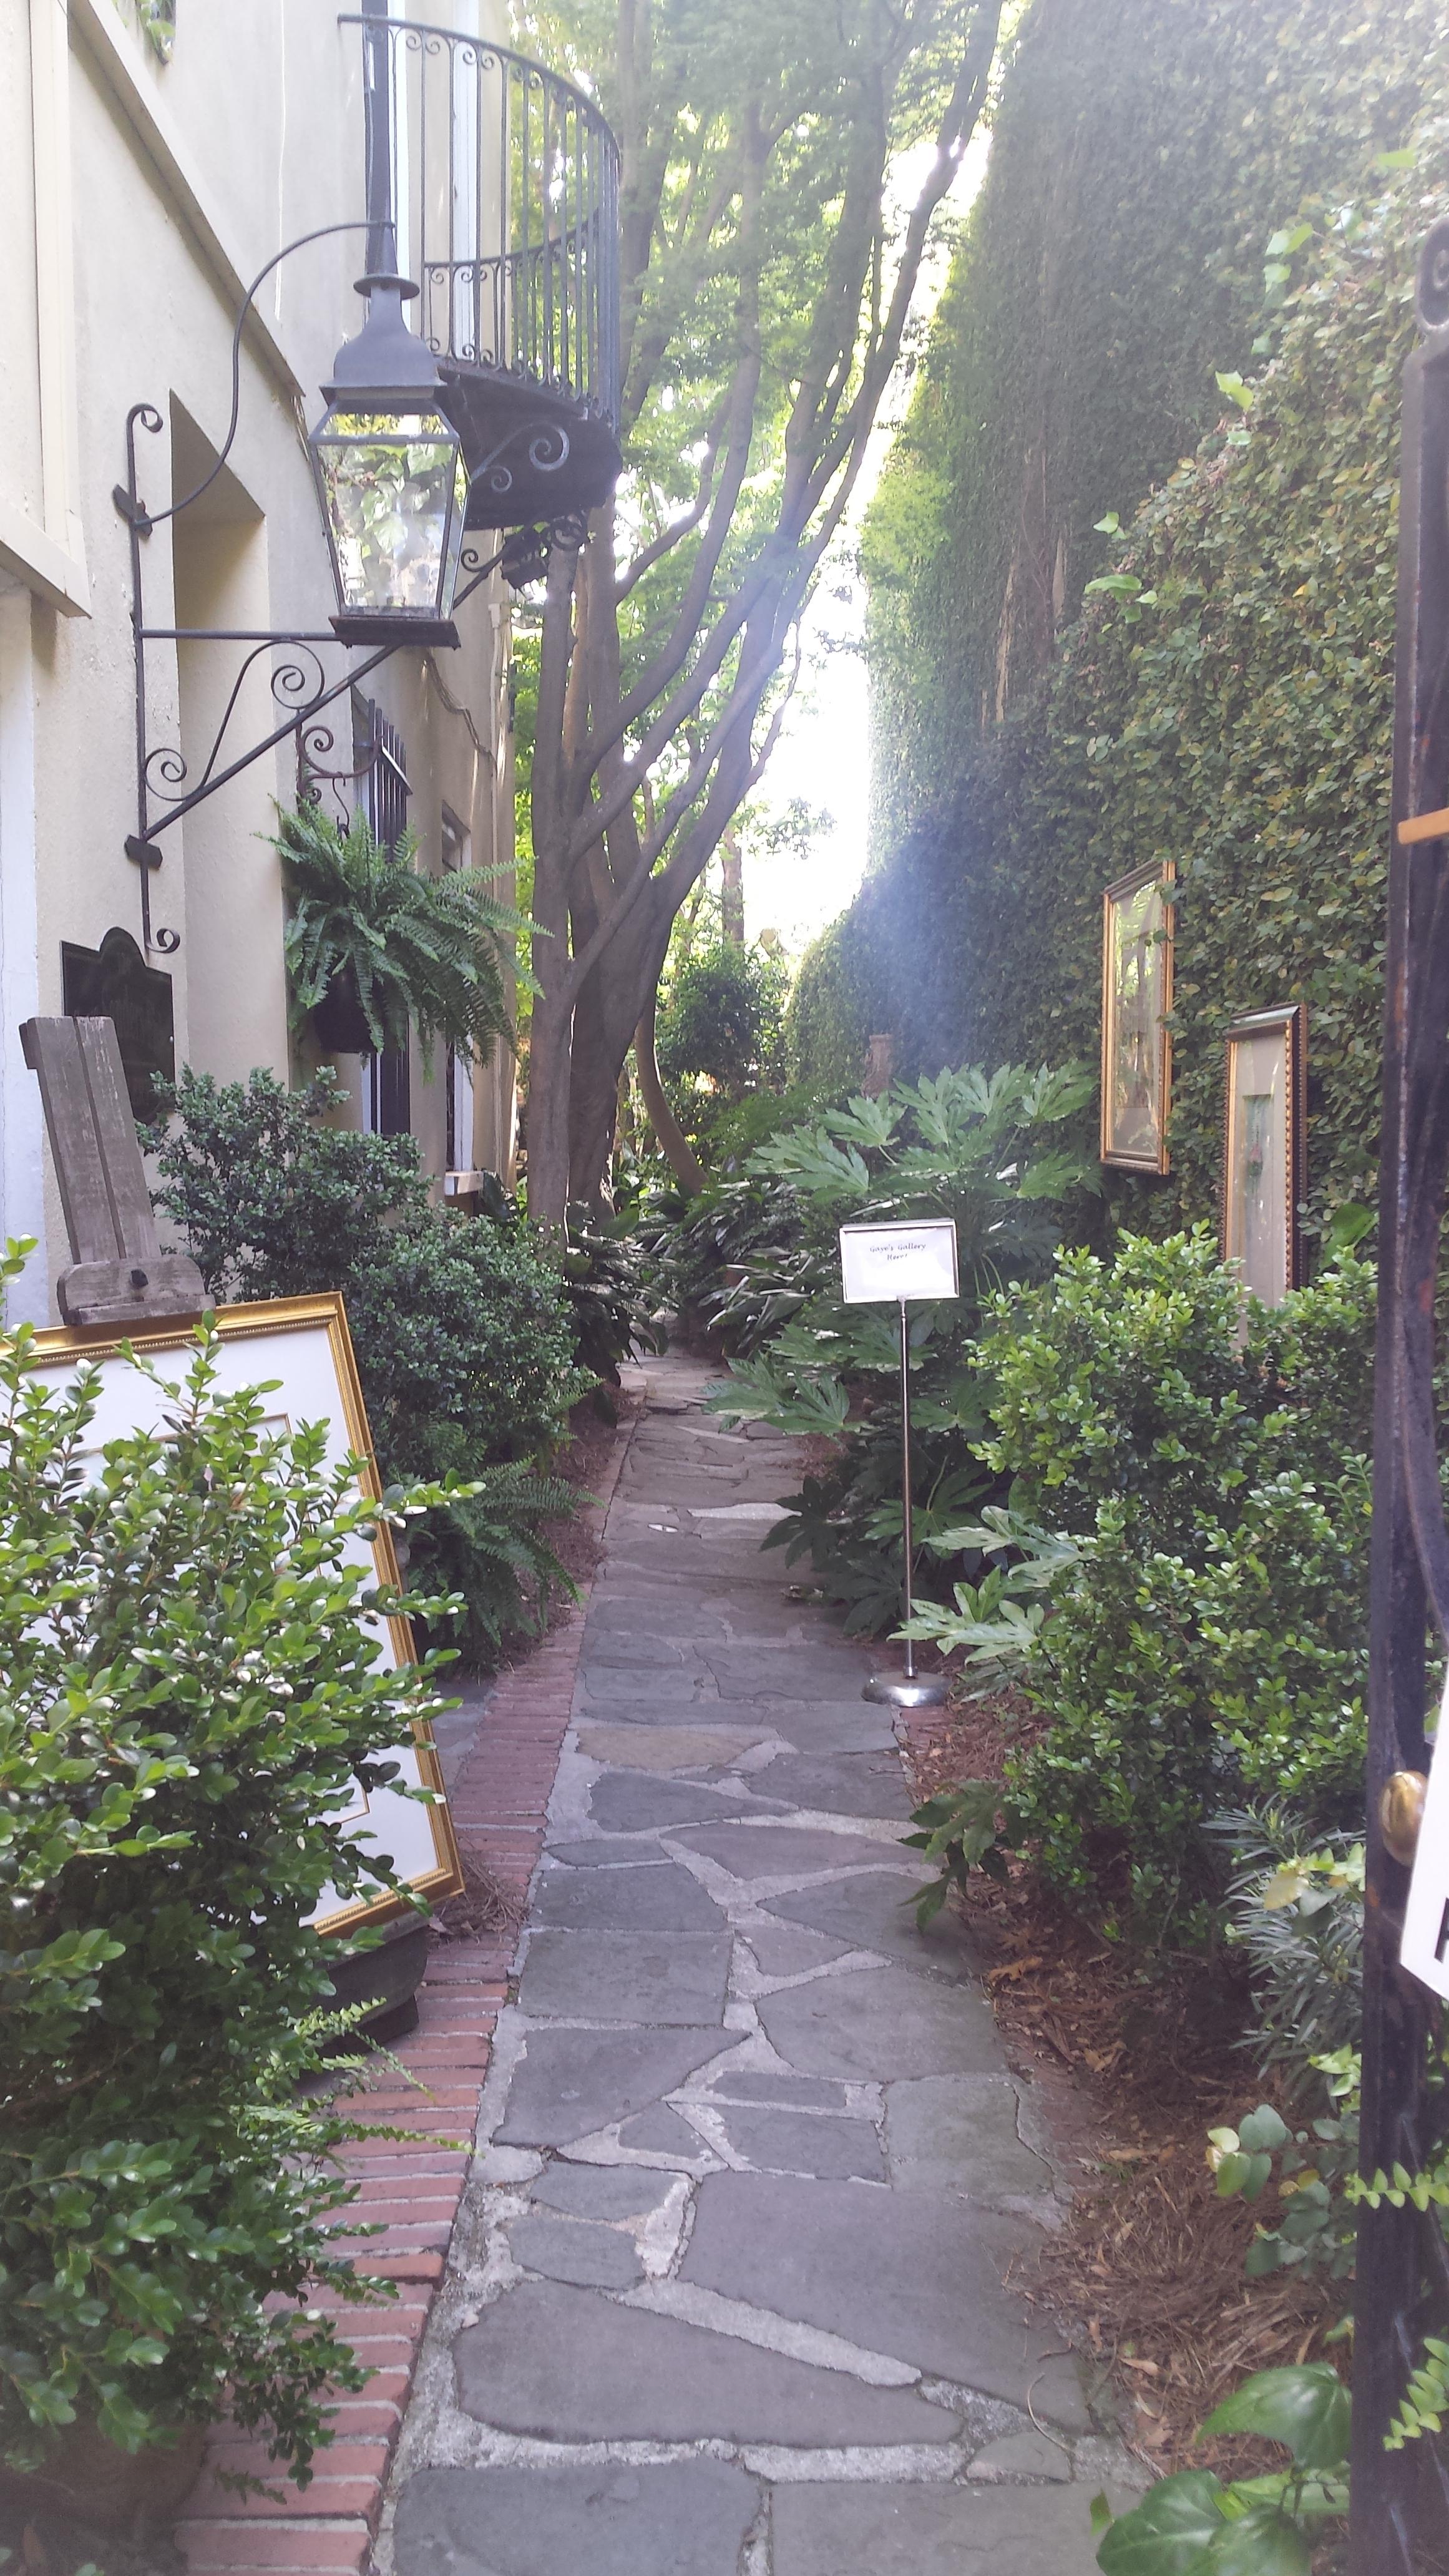 So many interesting courtyards around Charleston's historic district.